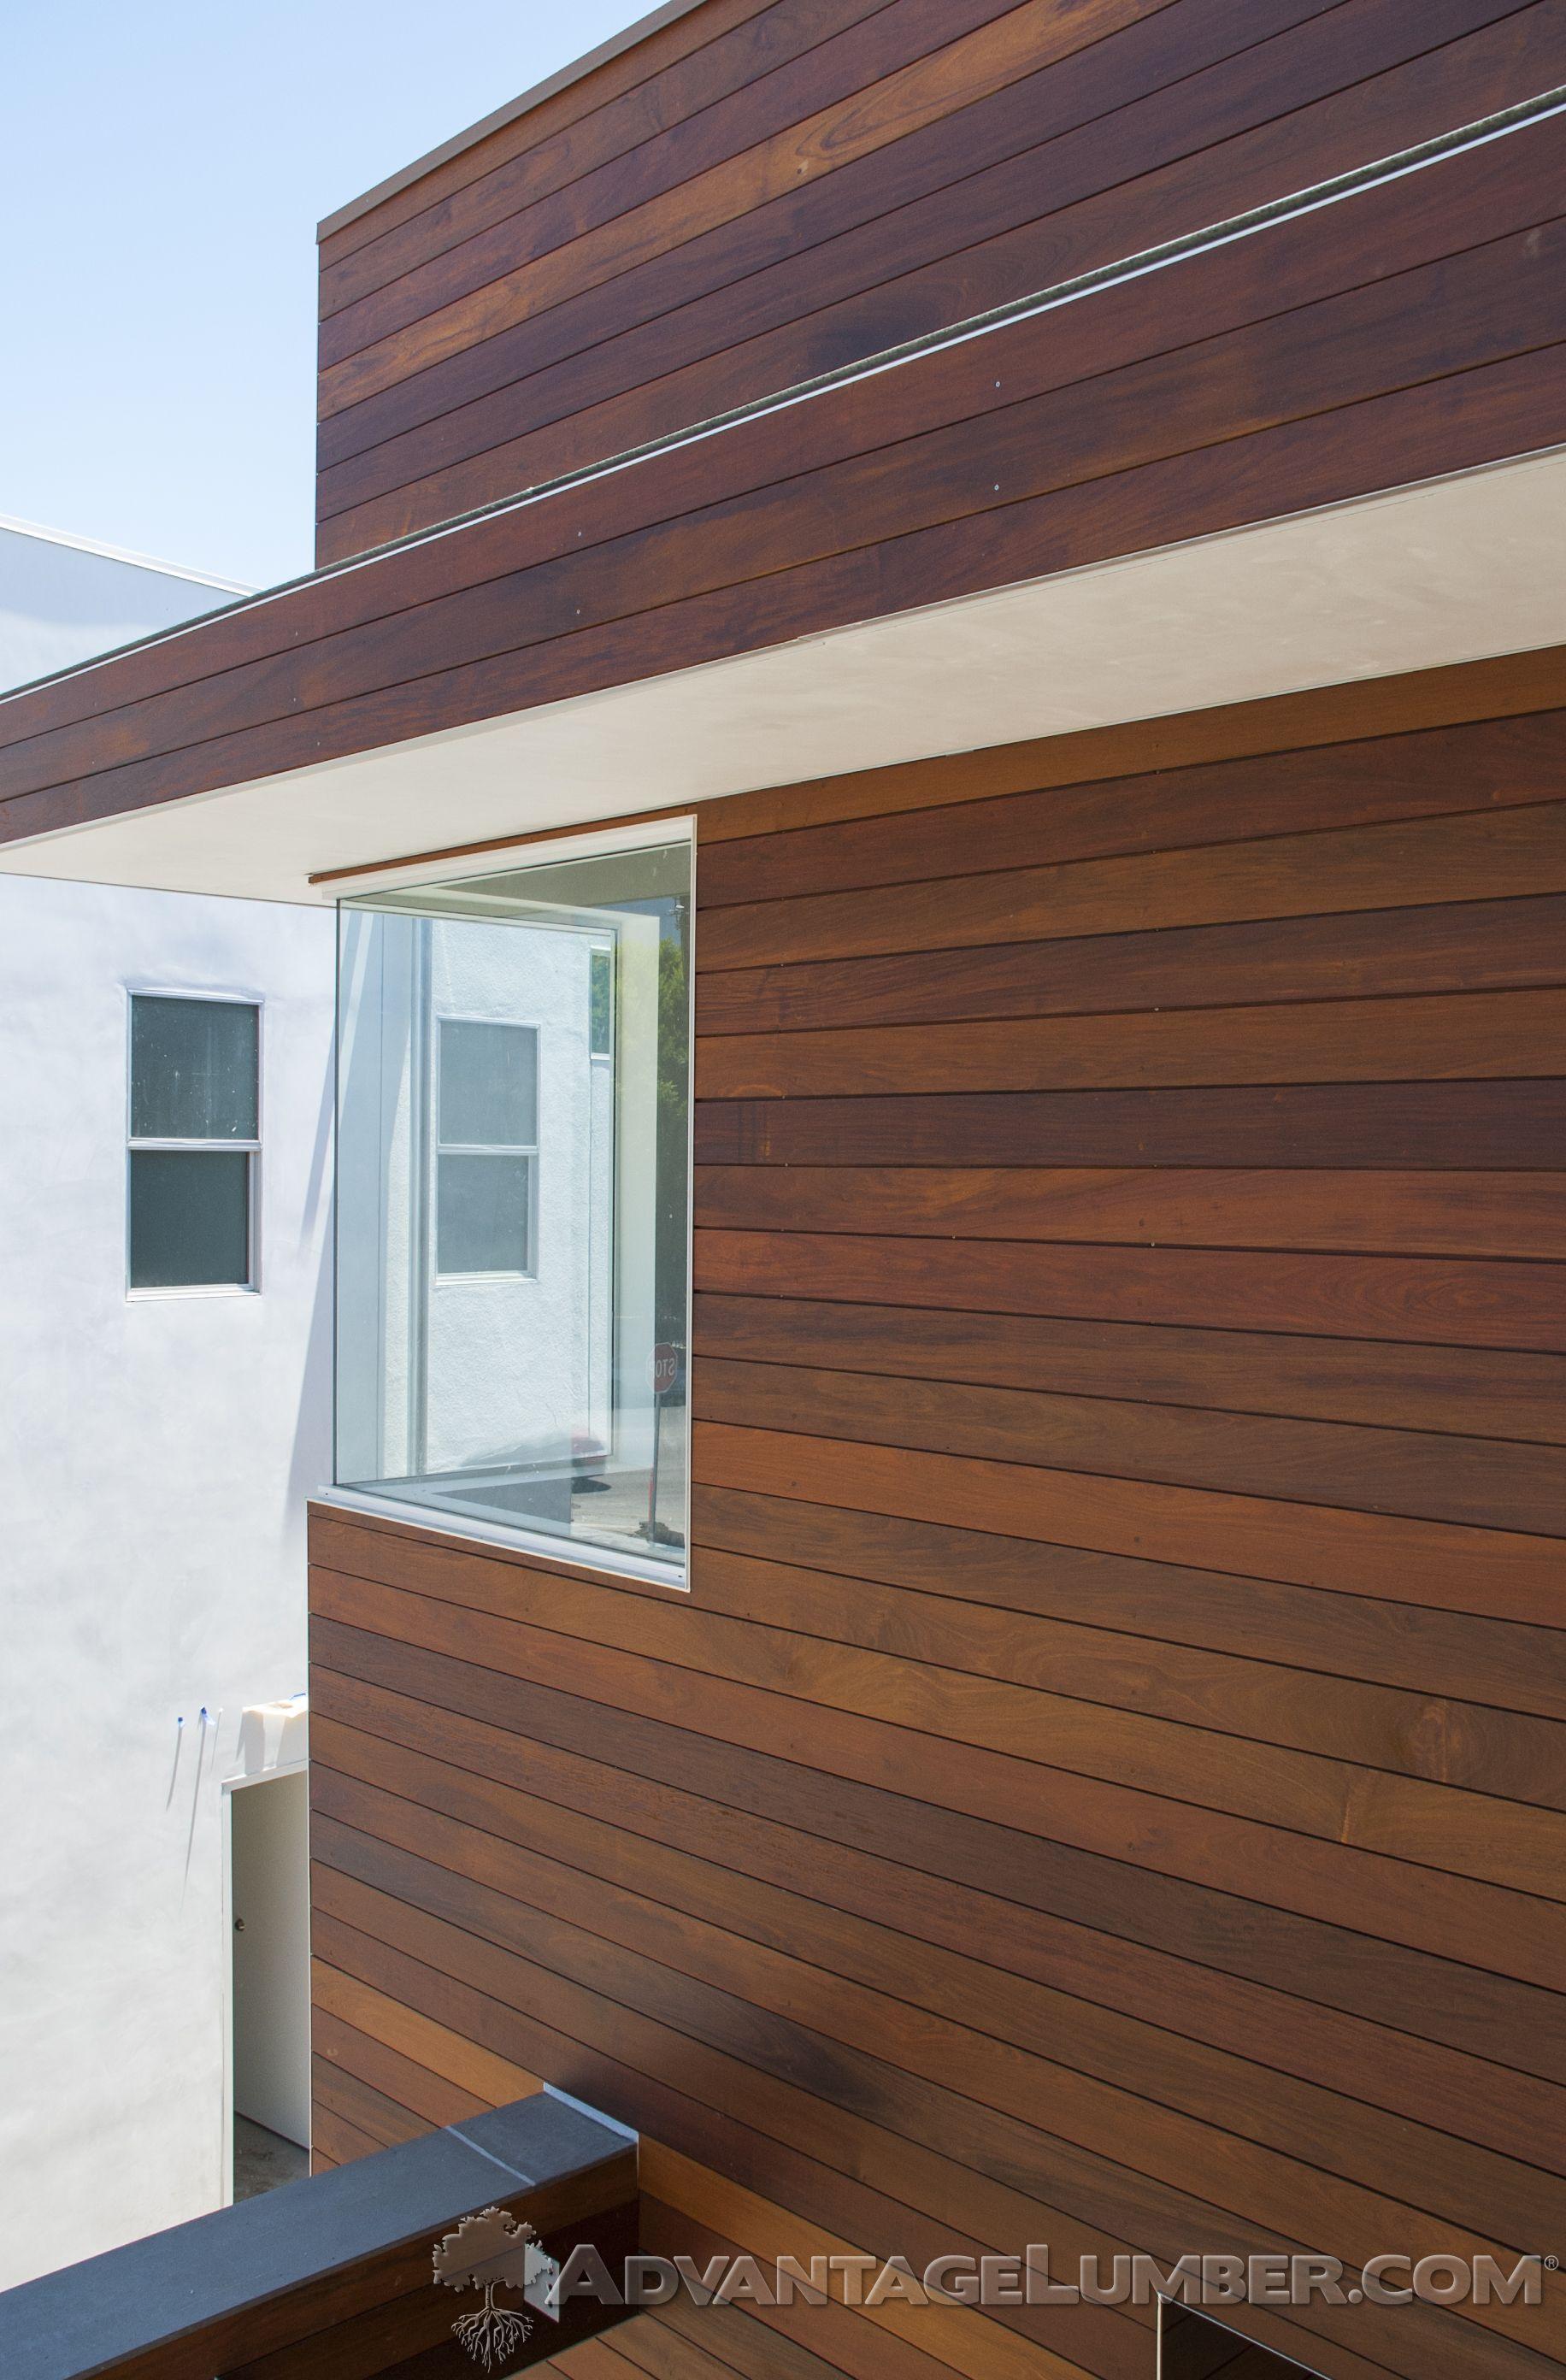 Advantage Ipe Shiplap Siding Will Make Your Home Stand Out From The Rest.  AdvantageLumber. Shiplap SidingClapboard SidingExterior SidingWood ...